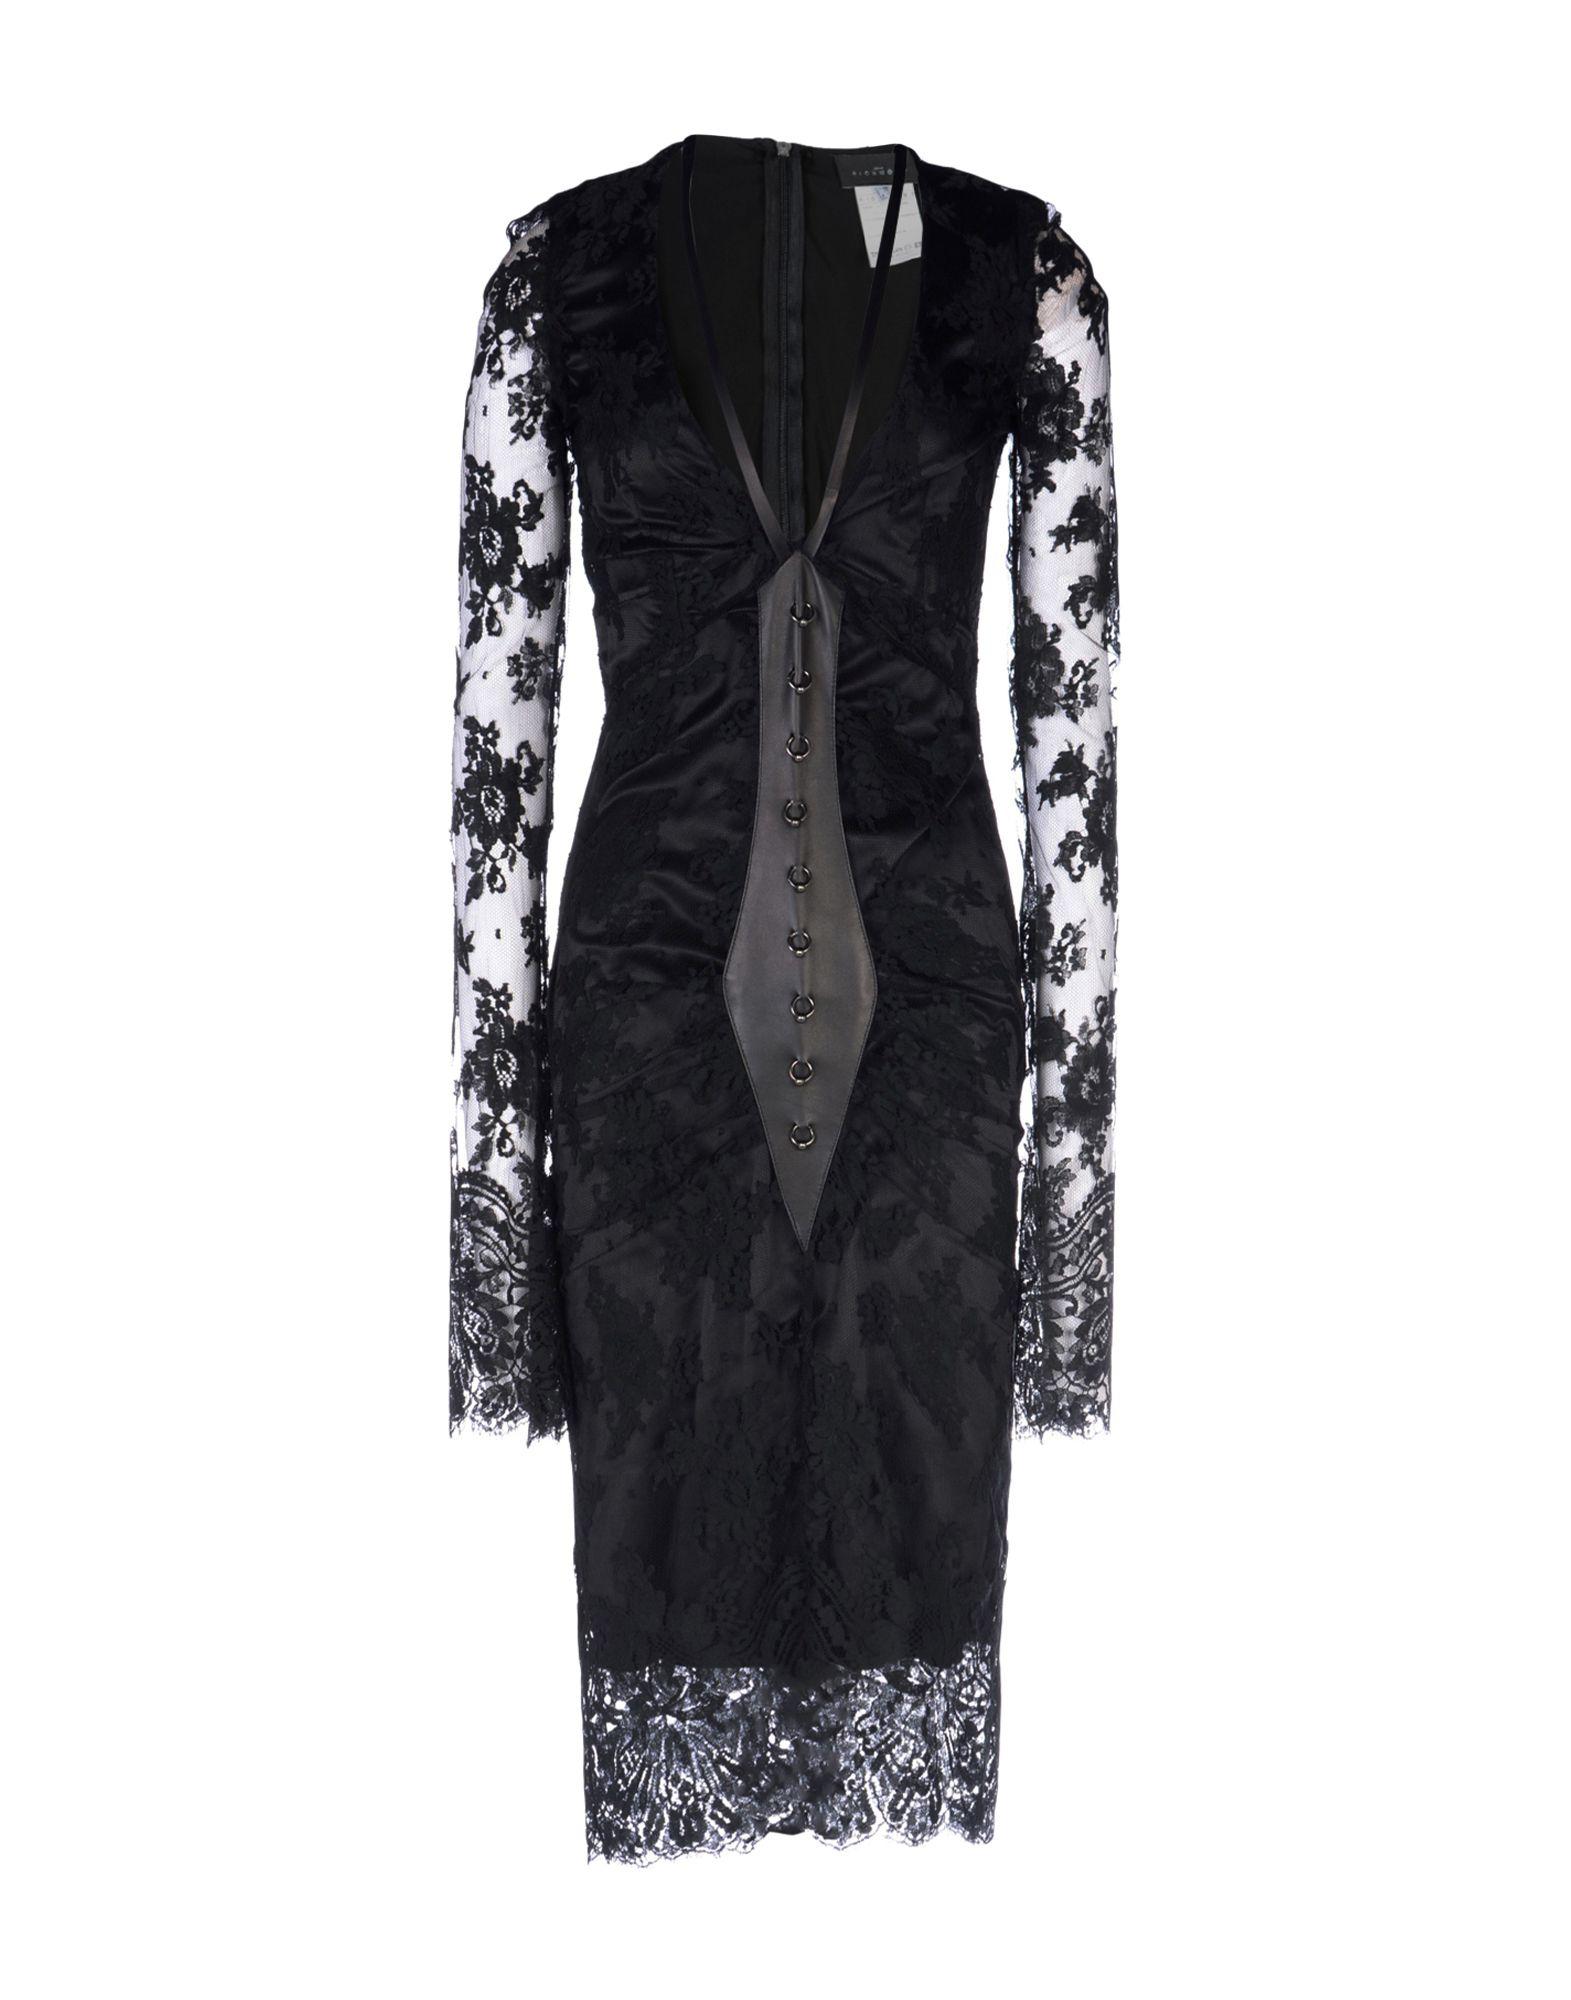 JOHN RICHMOND Платье длиной 3/4 lisa corti платье длиной 3 4